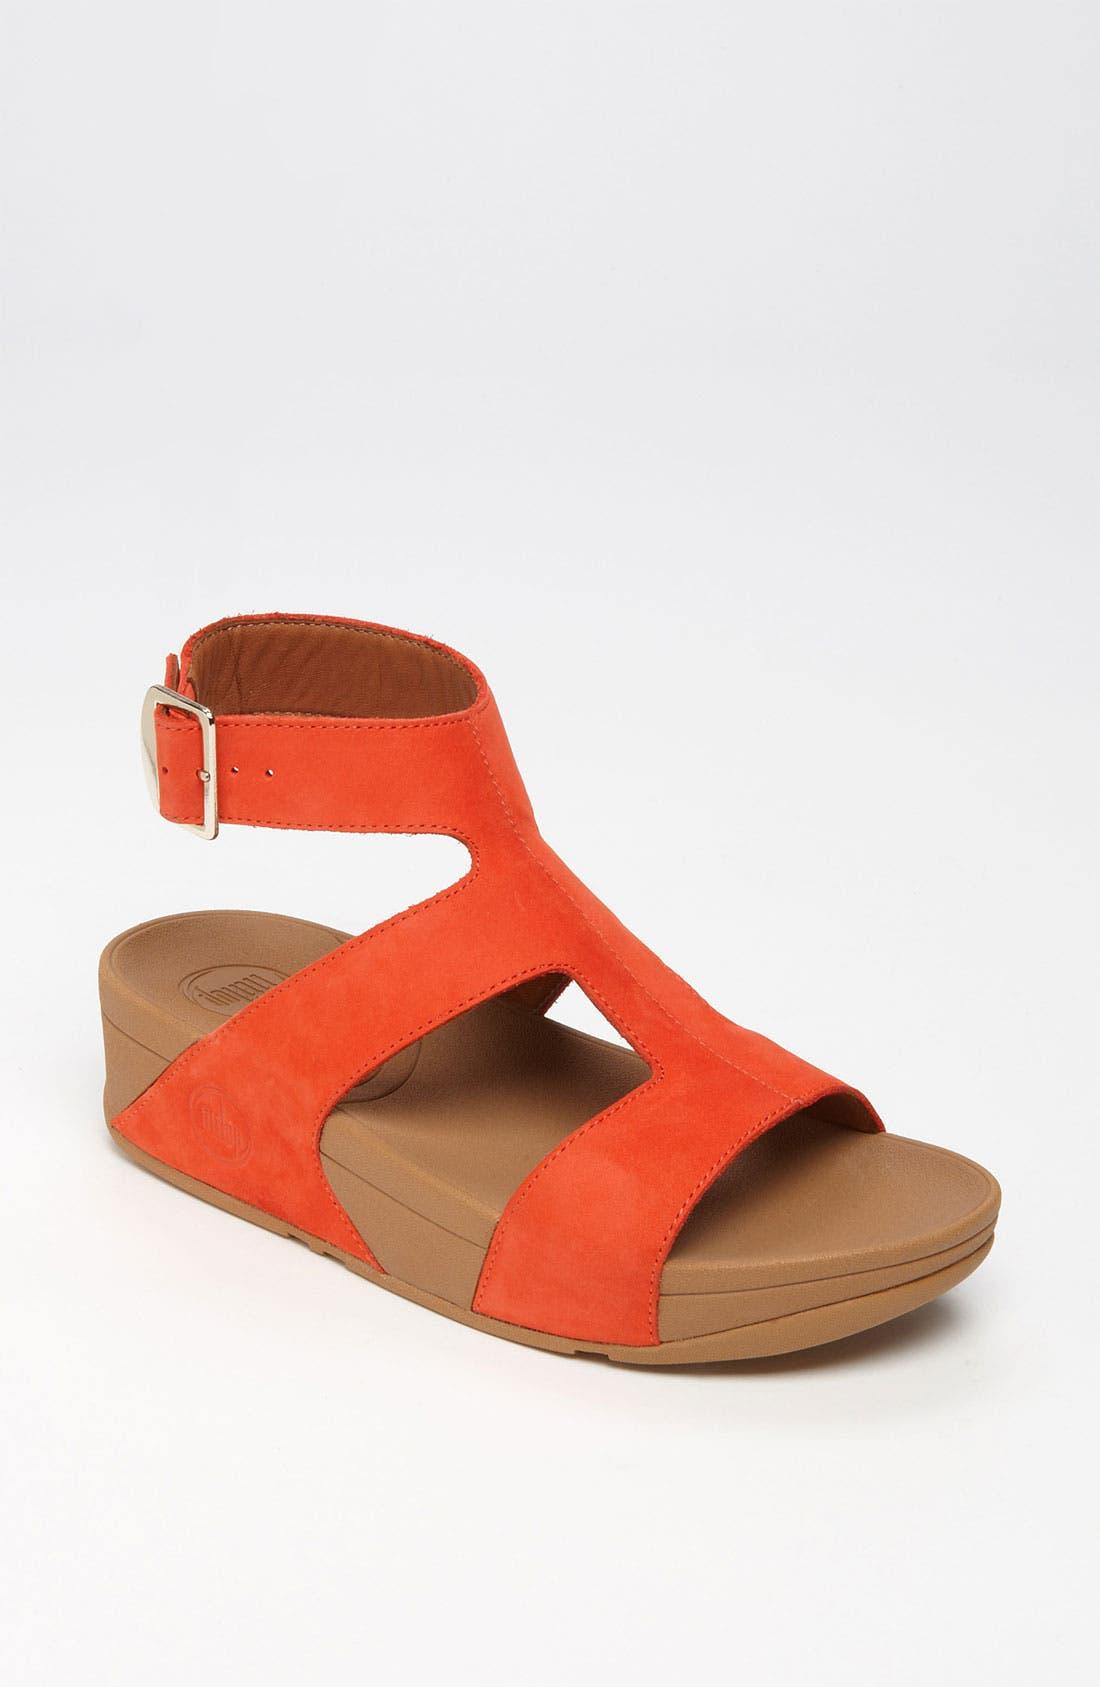 Alternate Image 1 Selected - FitFlop 'Arena™' Sandal